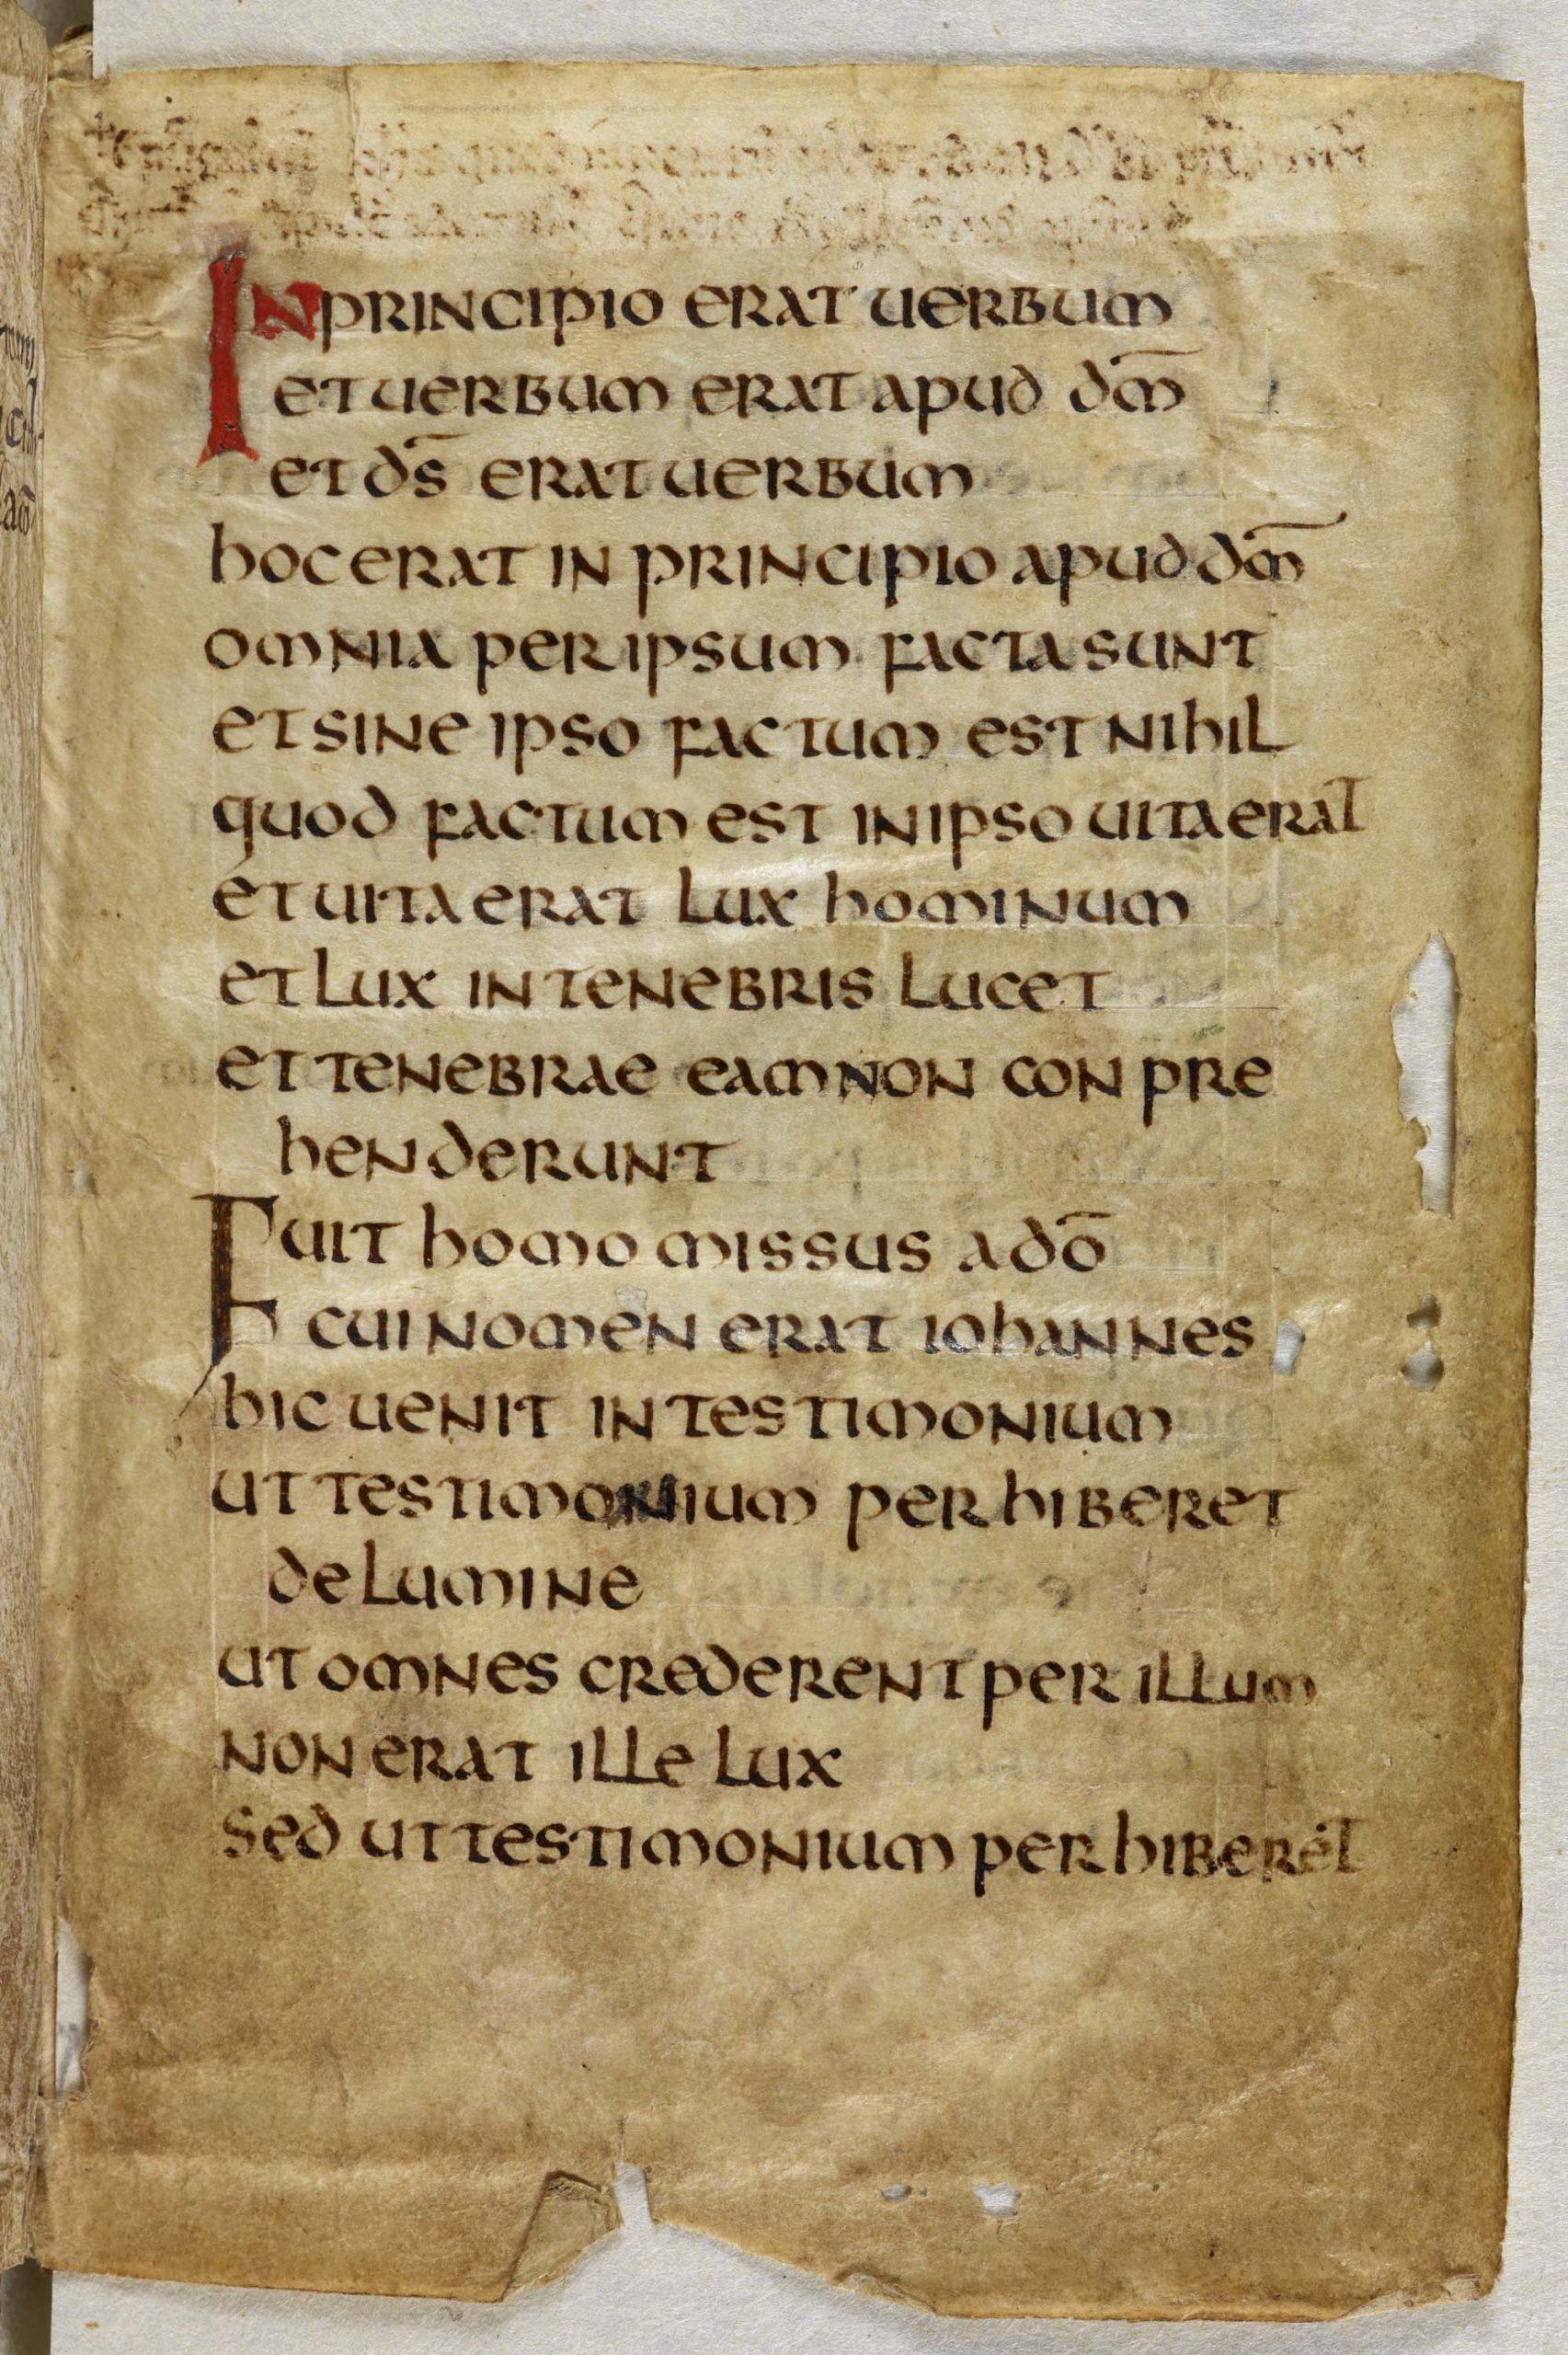 Latin Insular | Vhmml School tout Majuscule Script